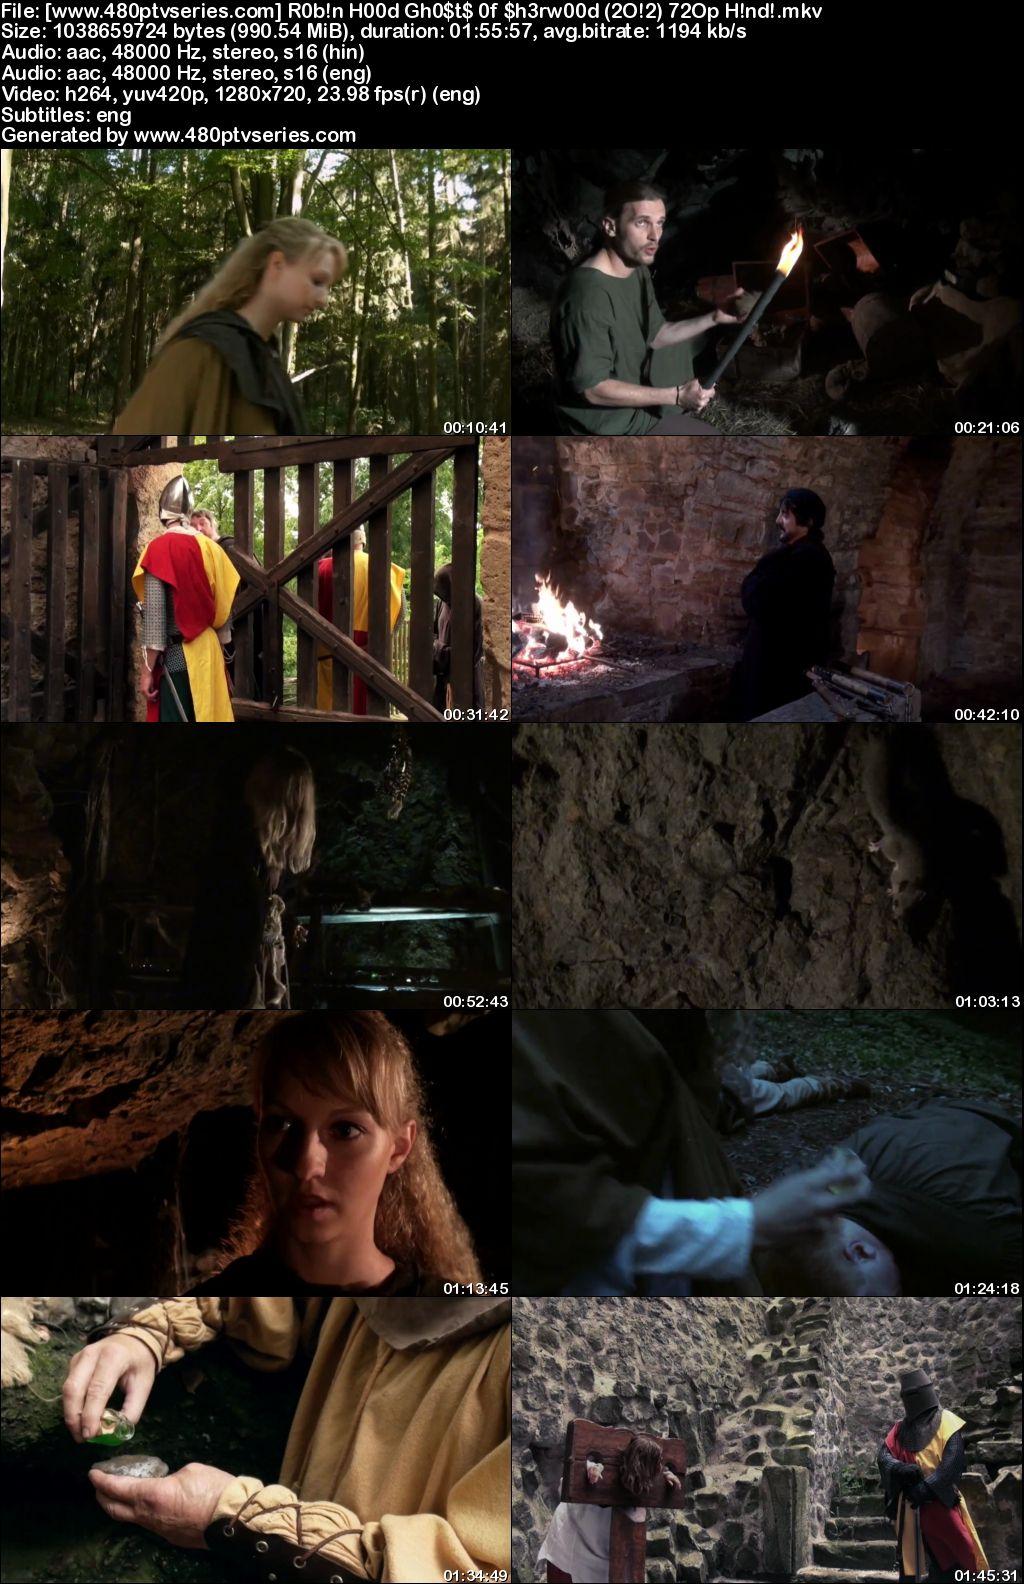 Watch Online Free Robin Hood: Ghosts of Sherwood (2012) Full Hindi Dual Audio Movie Download 480p 720p Bluray